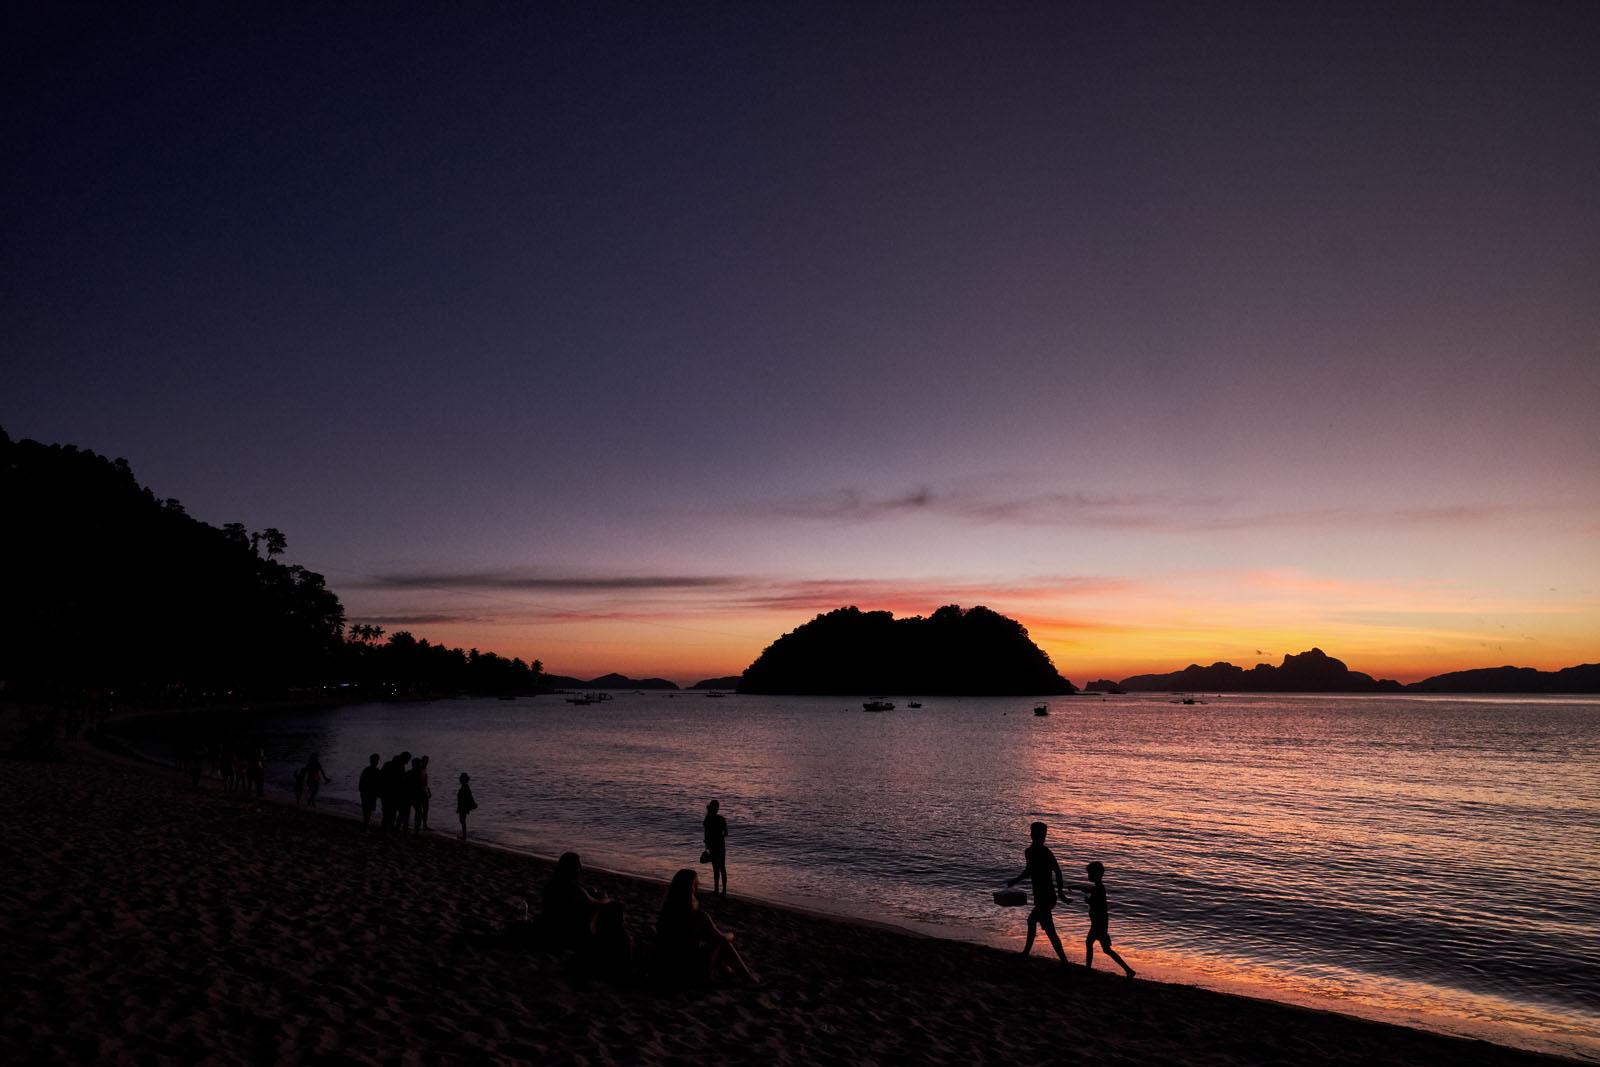 Marimegmeg Beach, famous for its sunsets